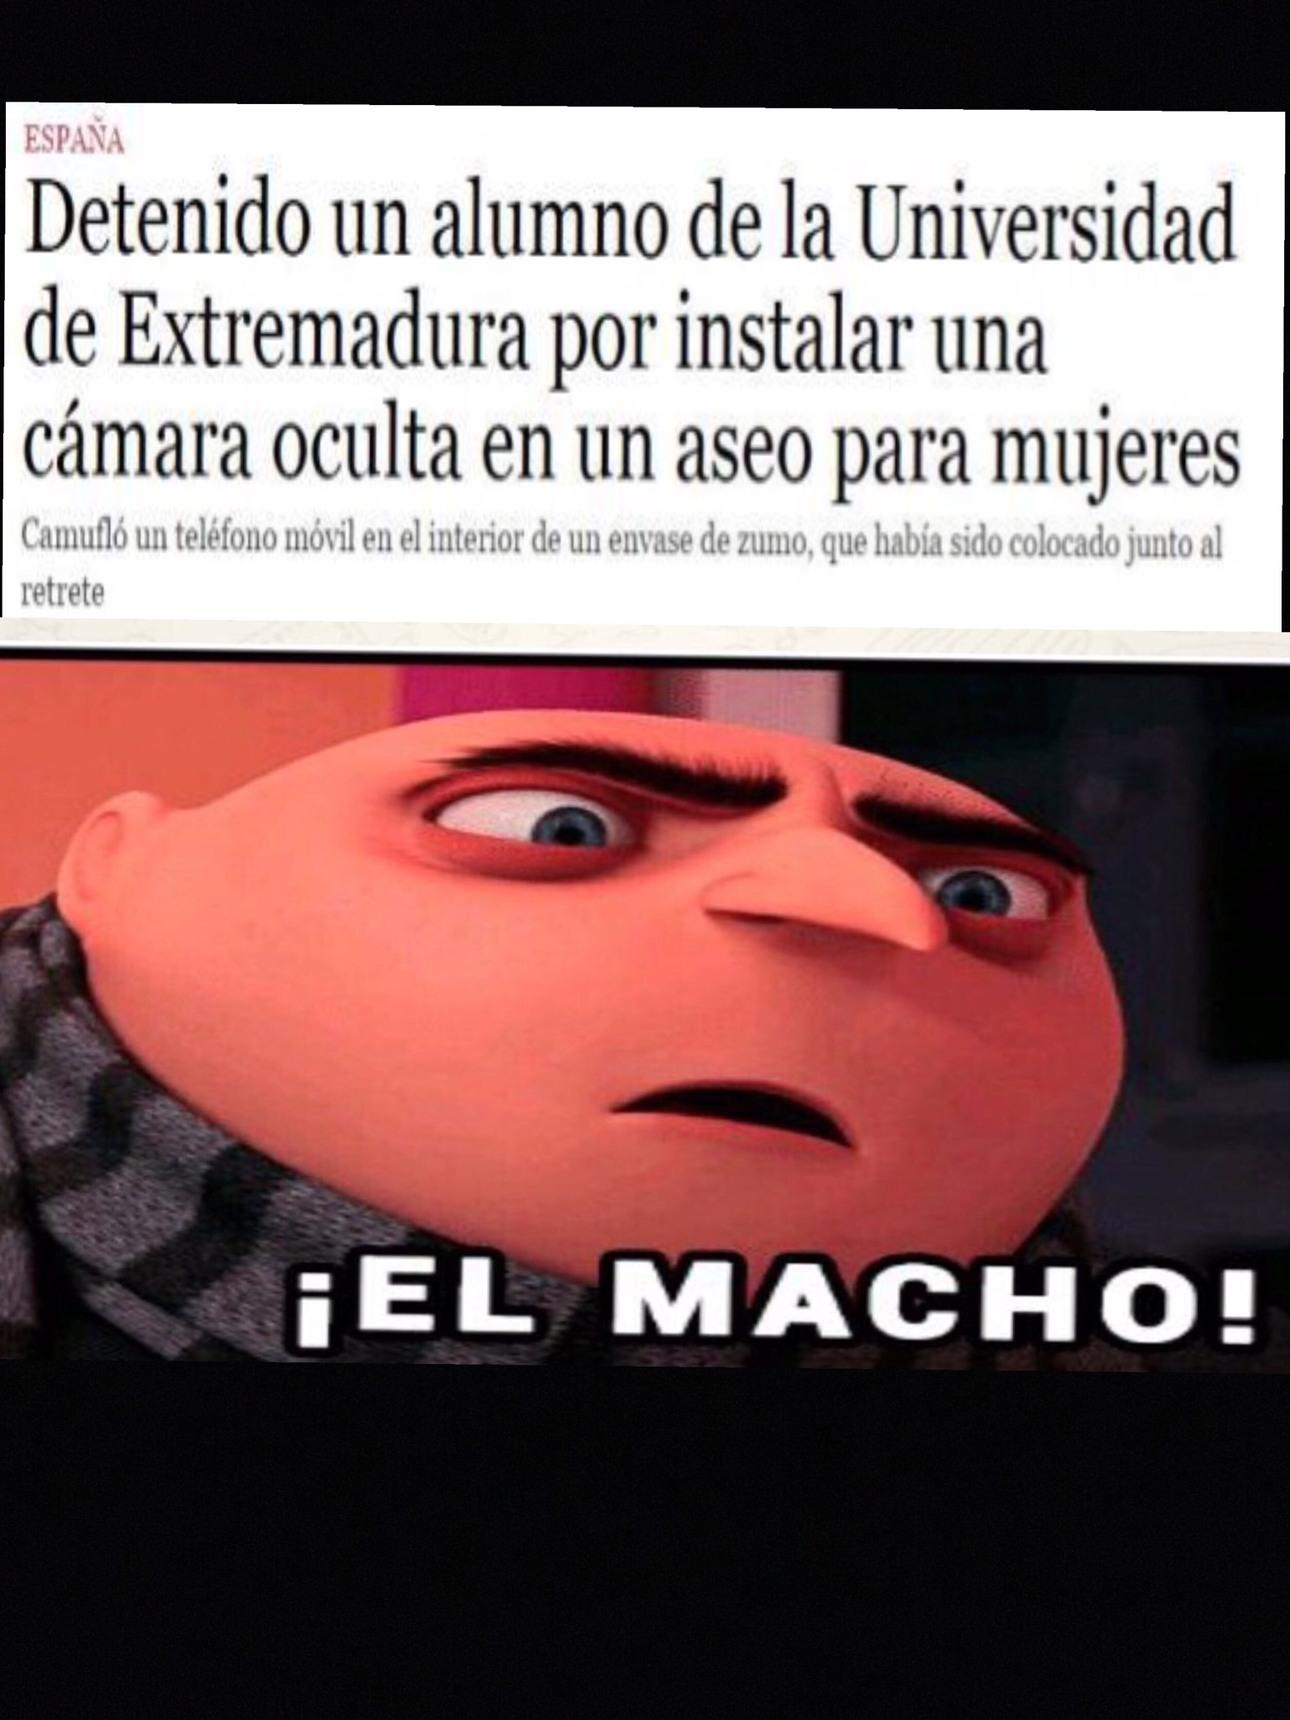 el macho:0 - meme